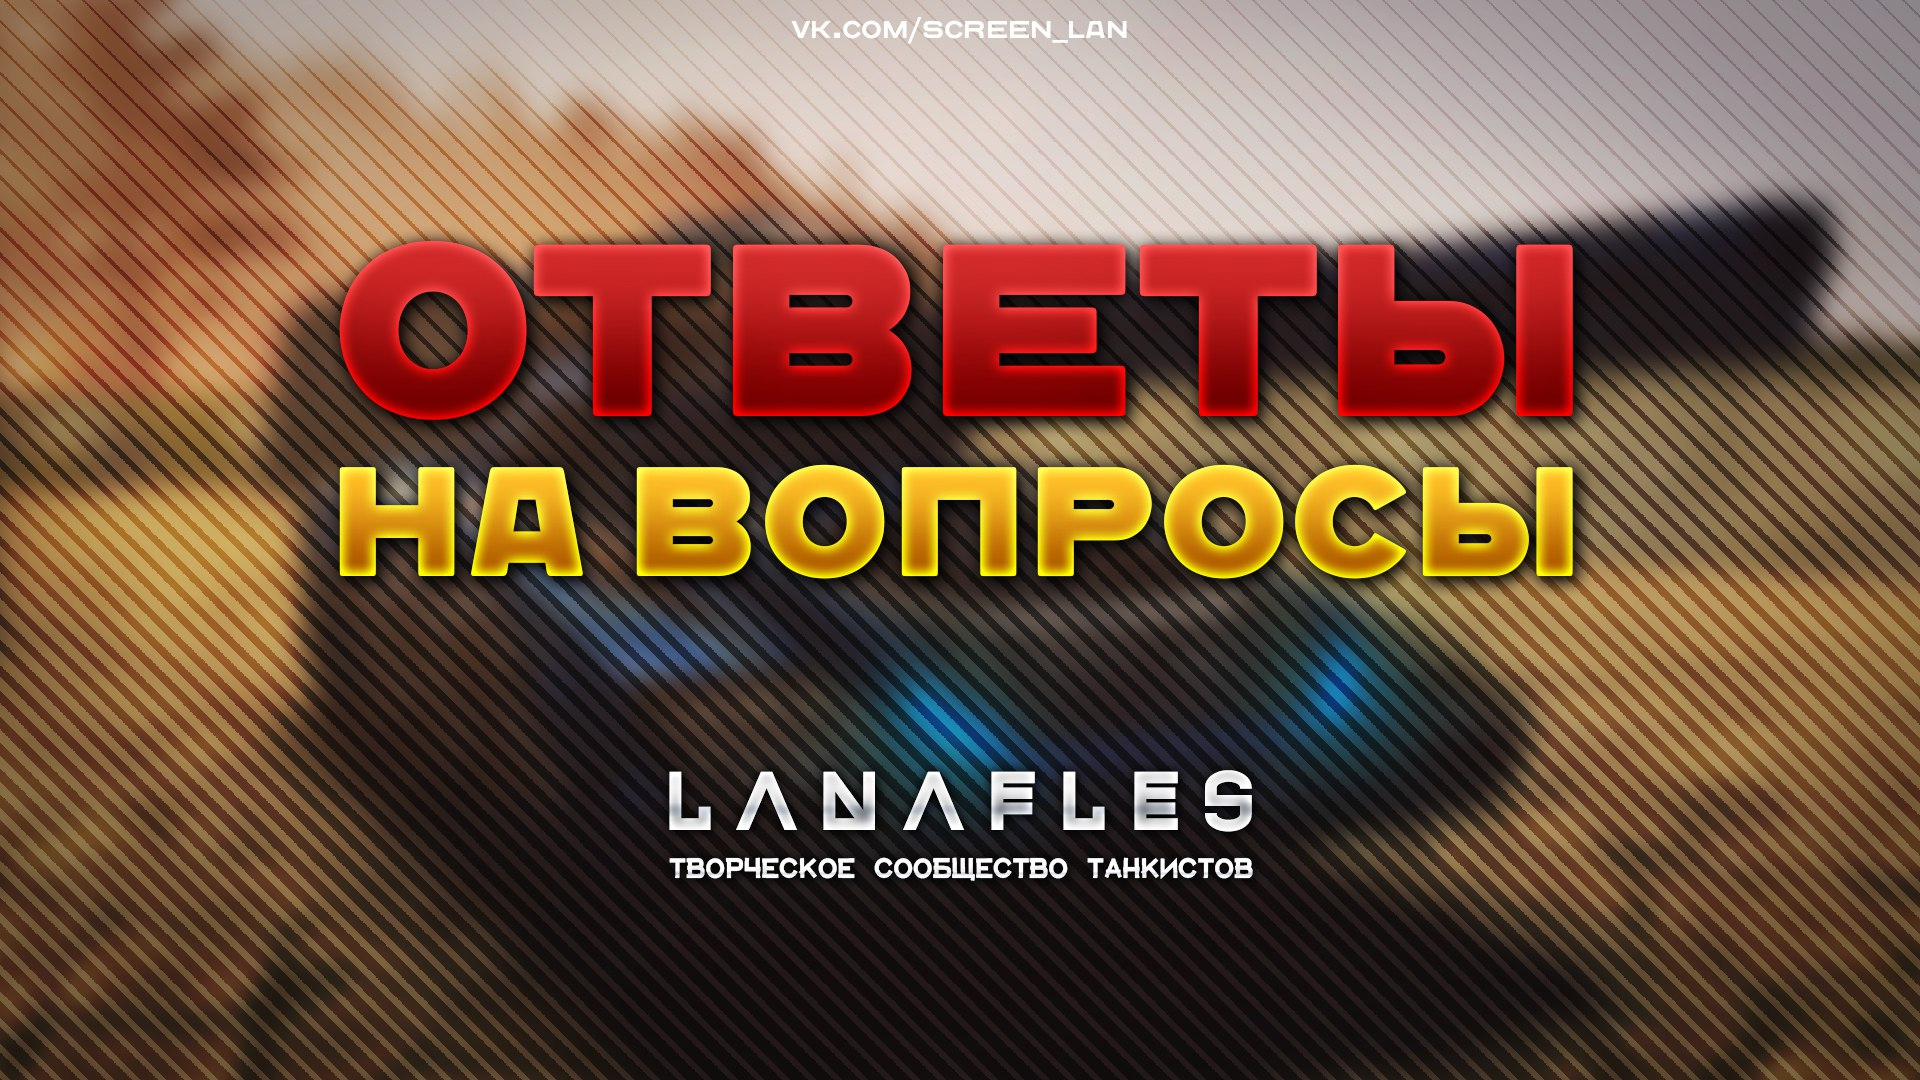 Билеты и абонементы  ХК Торпедо Нижний Новгород